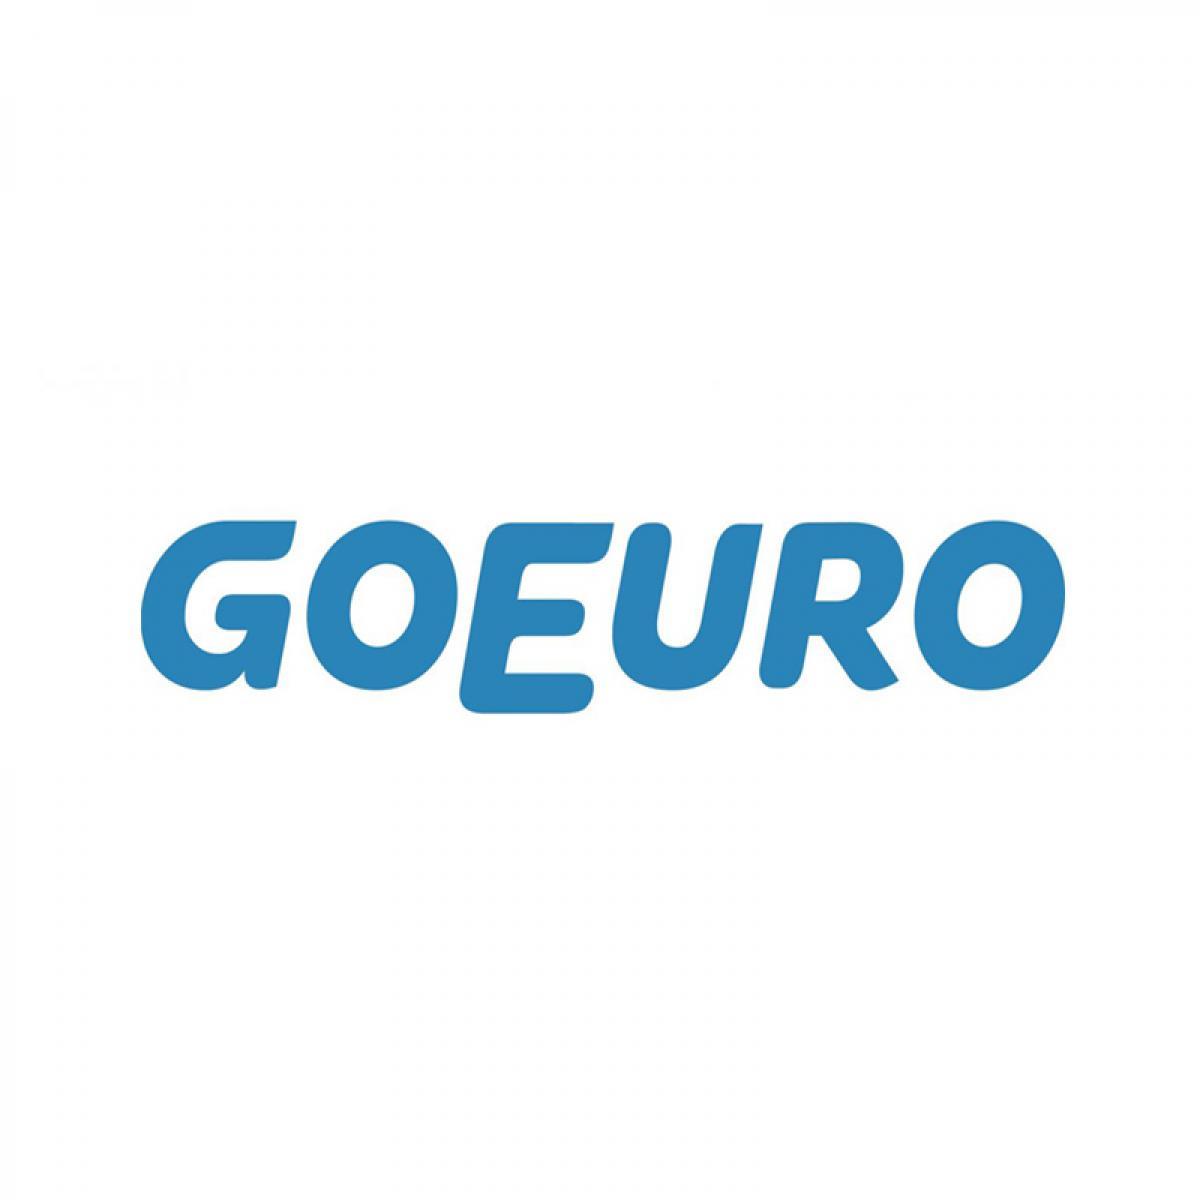 Colonia Nova - GoEuro - Corporate Offside